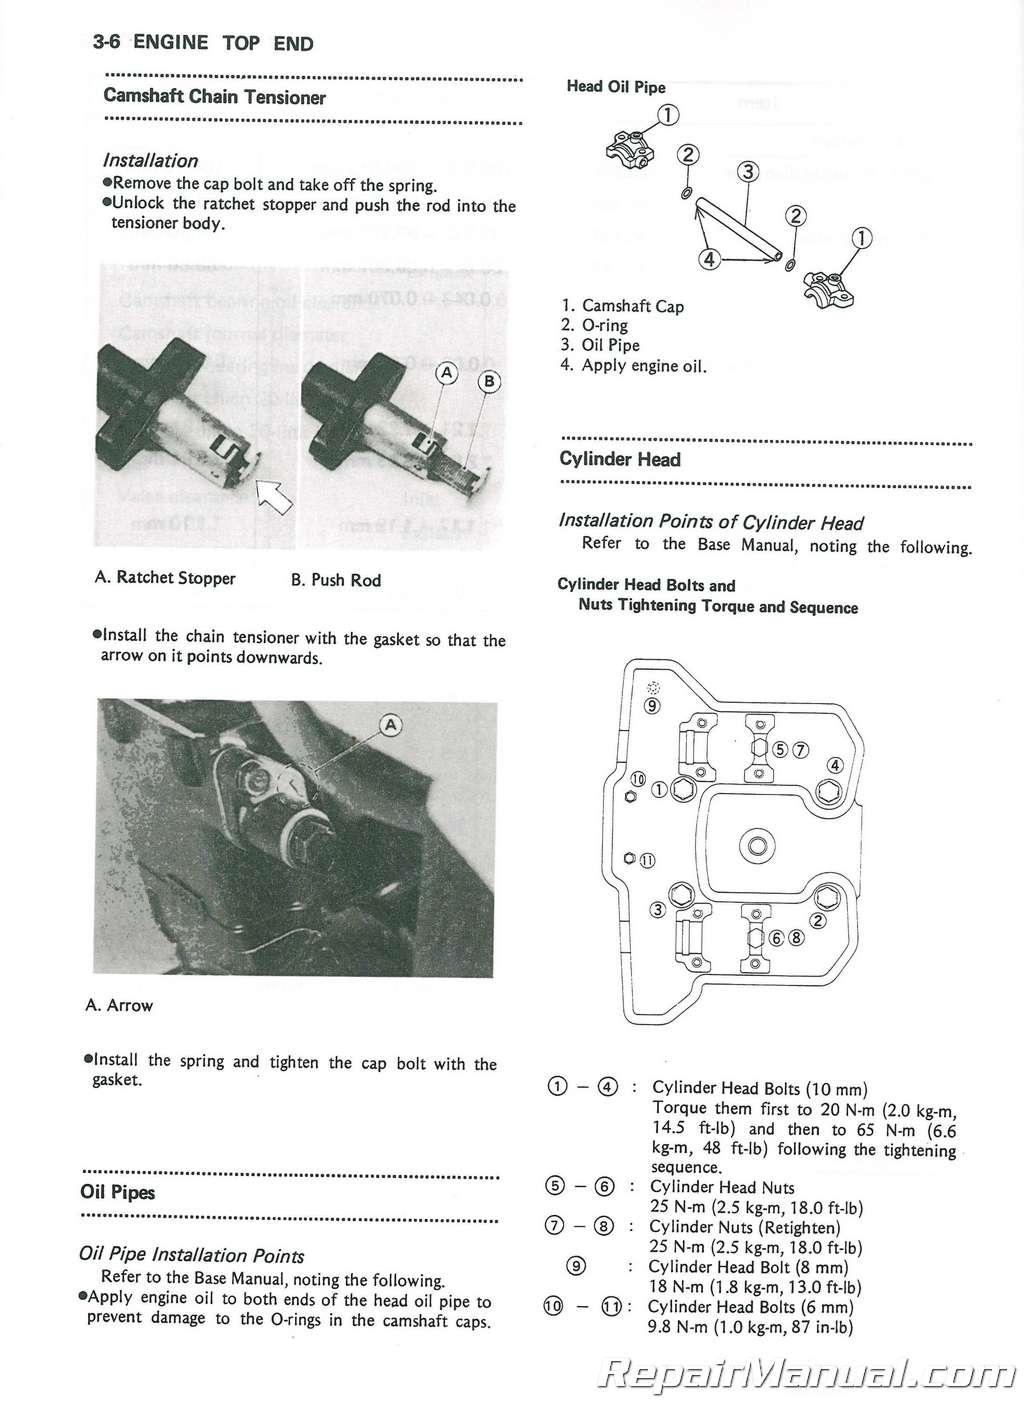 ... 1987-2004-Kawasaki-KLR650-Service-Manual-Supplement_004.jpg ...